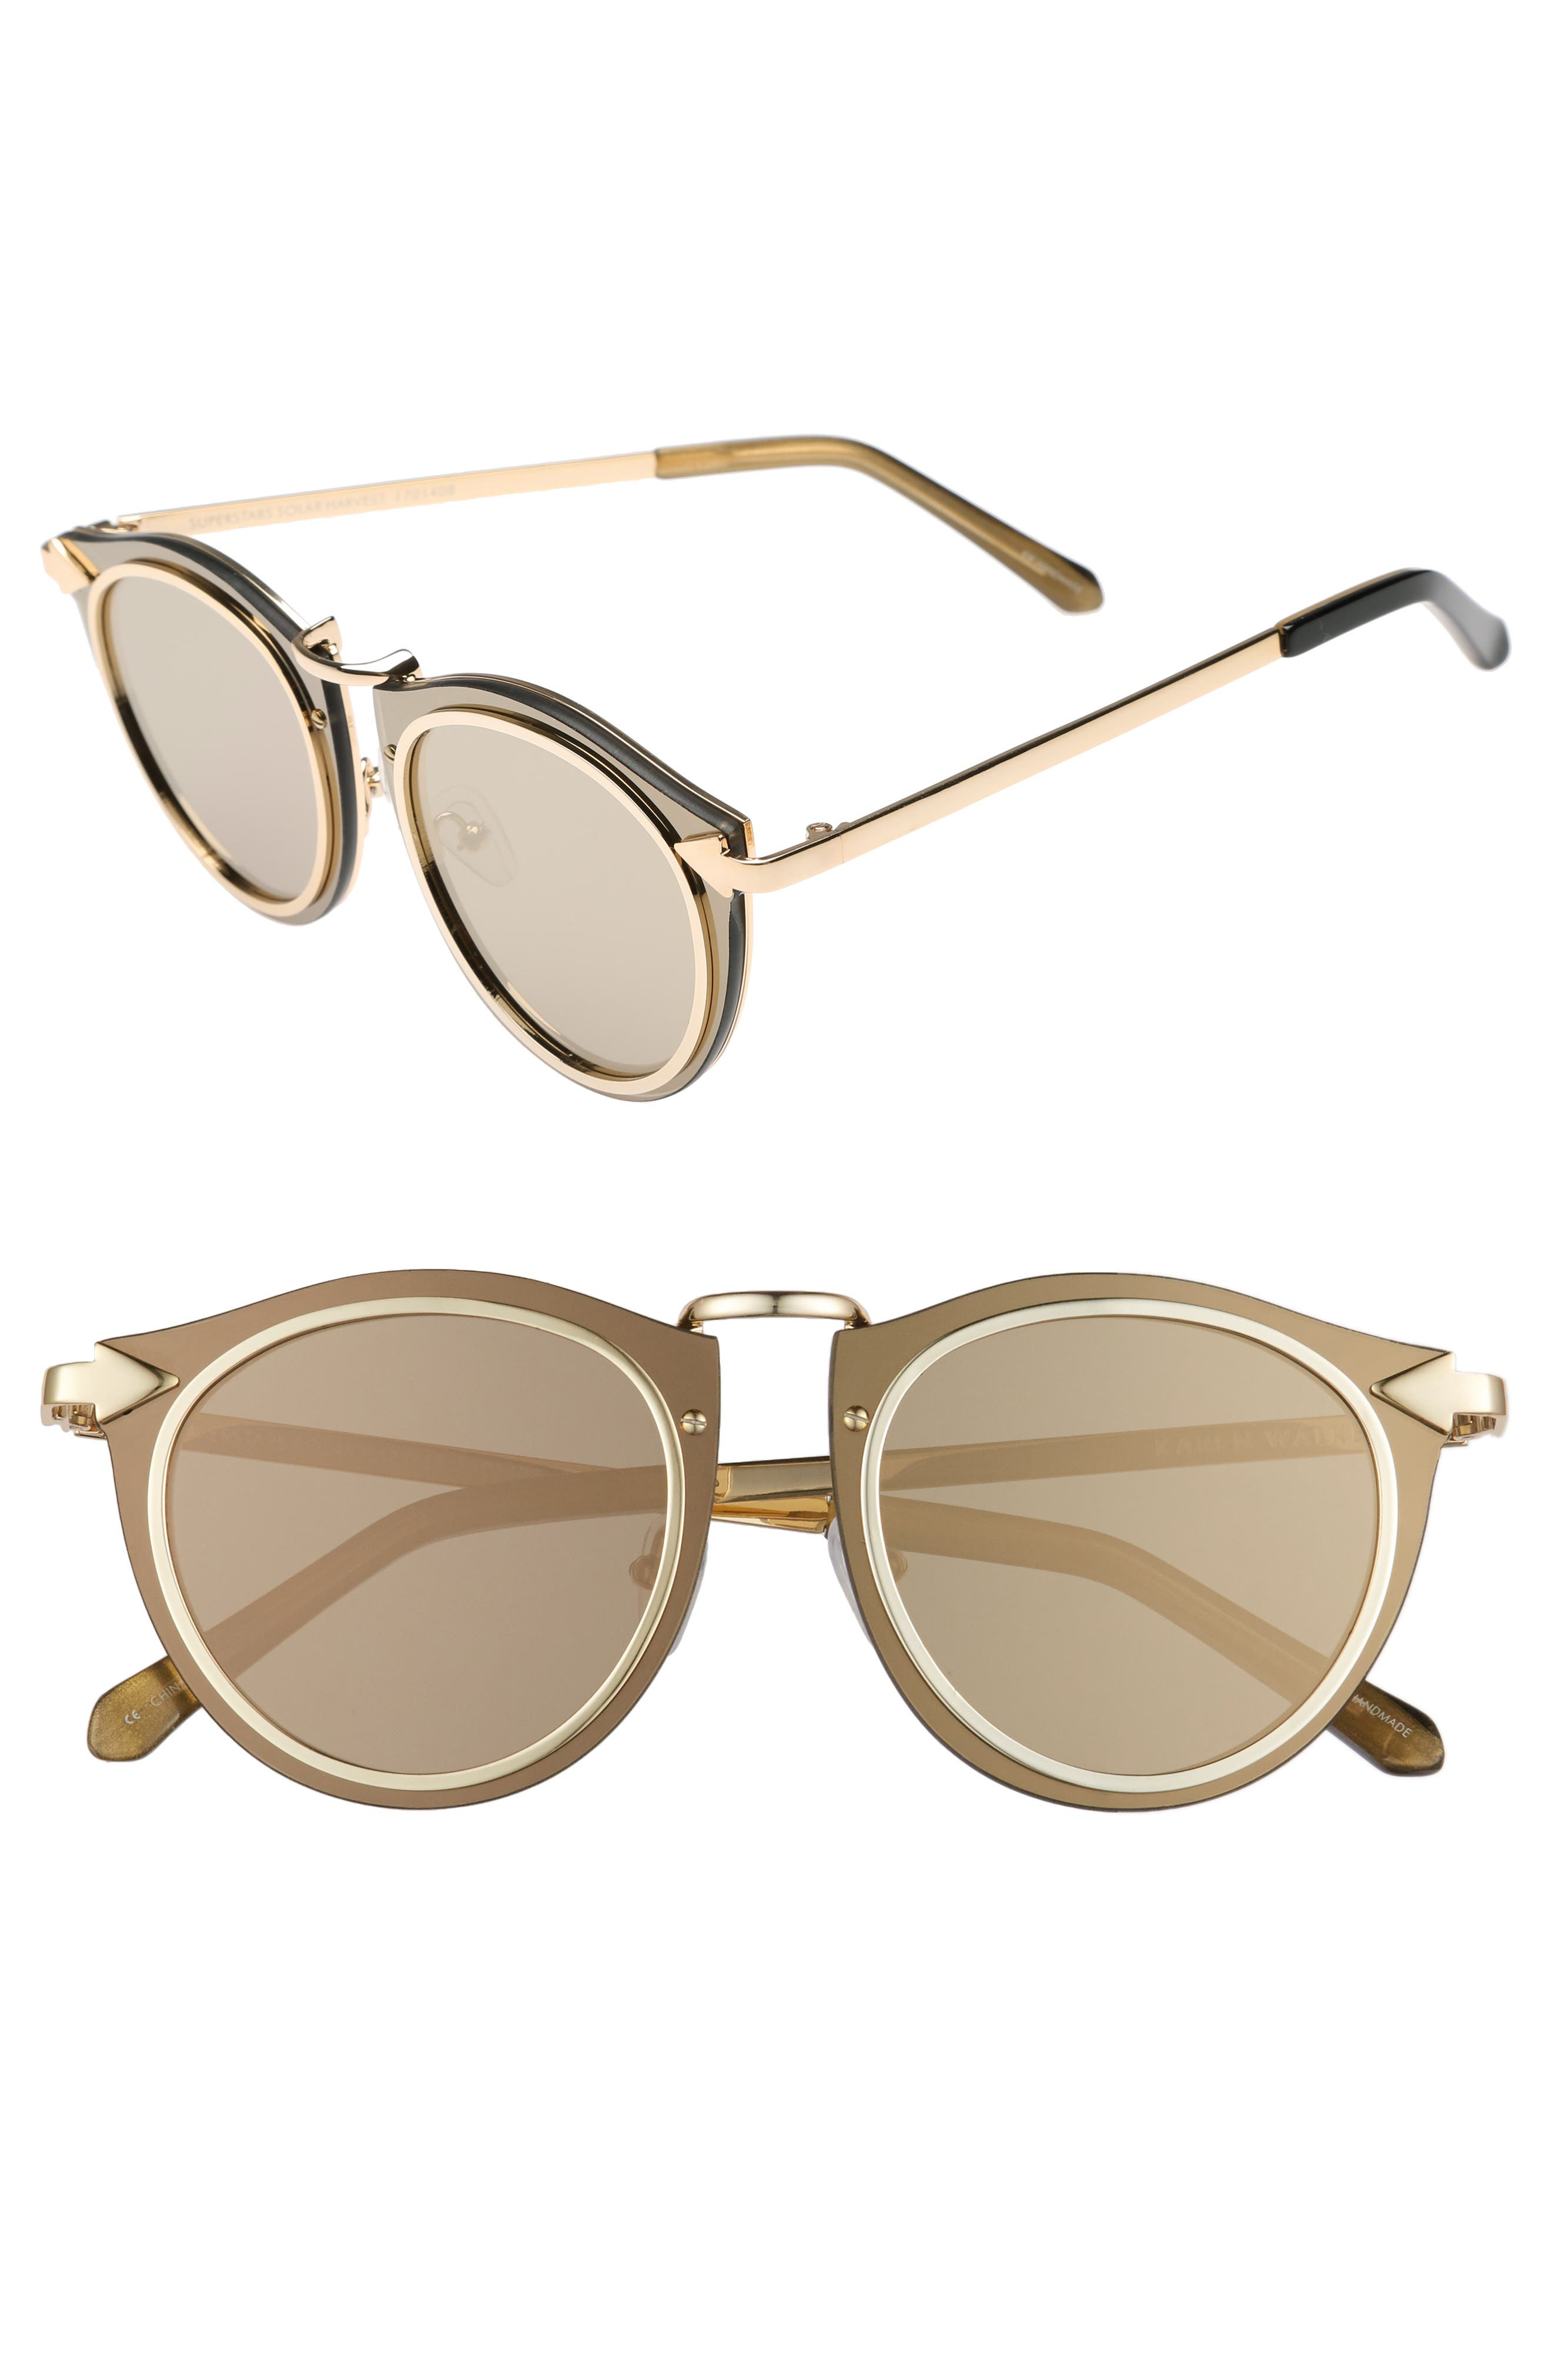 Superstars - Solar 50mm Retro Sunglasses,                             Main thumbnail 1, color,                             Gold